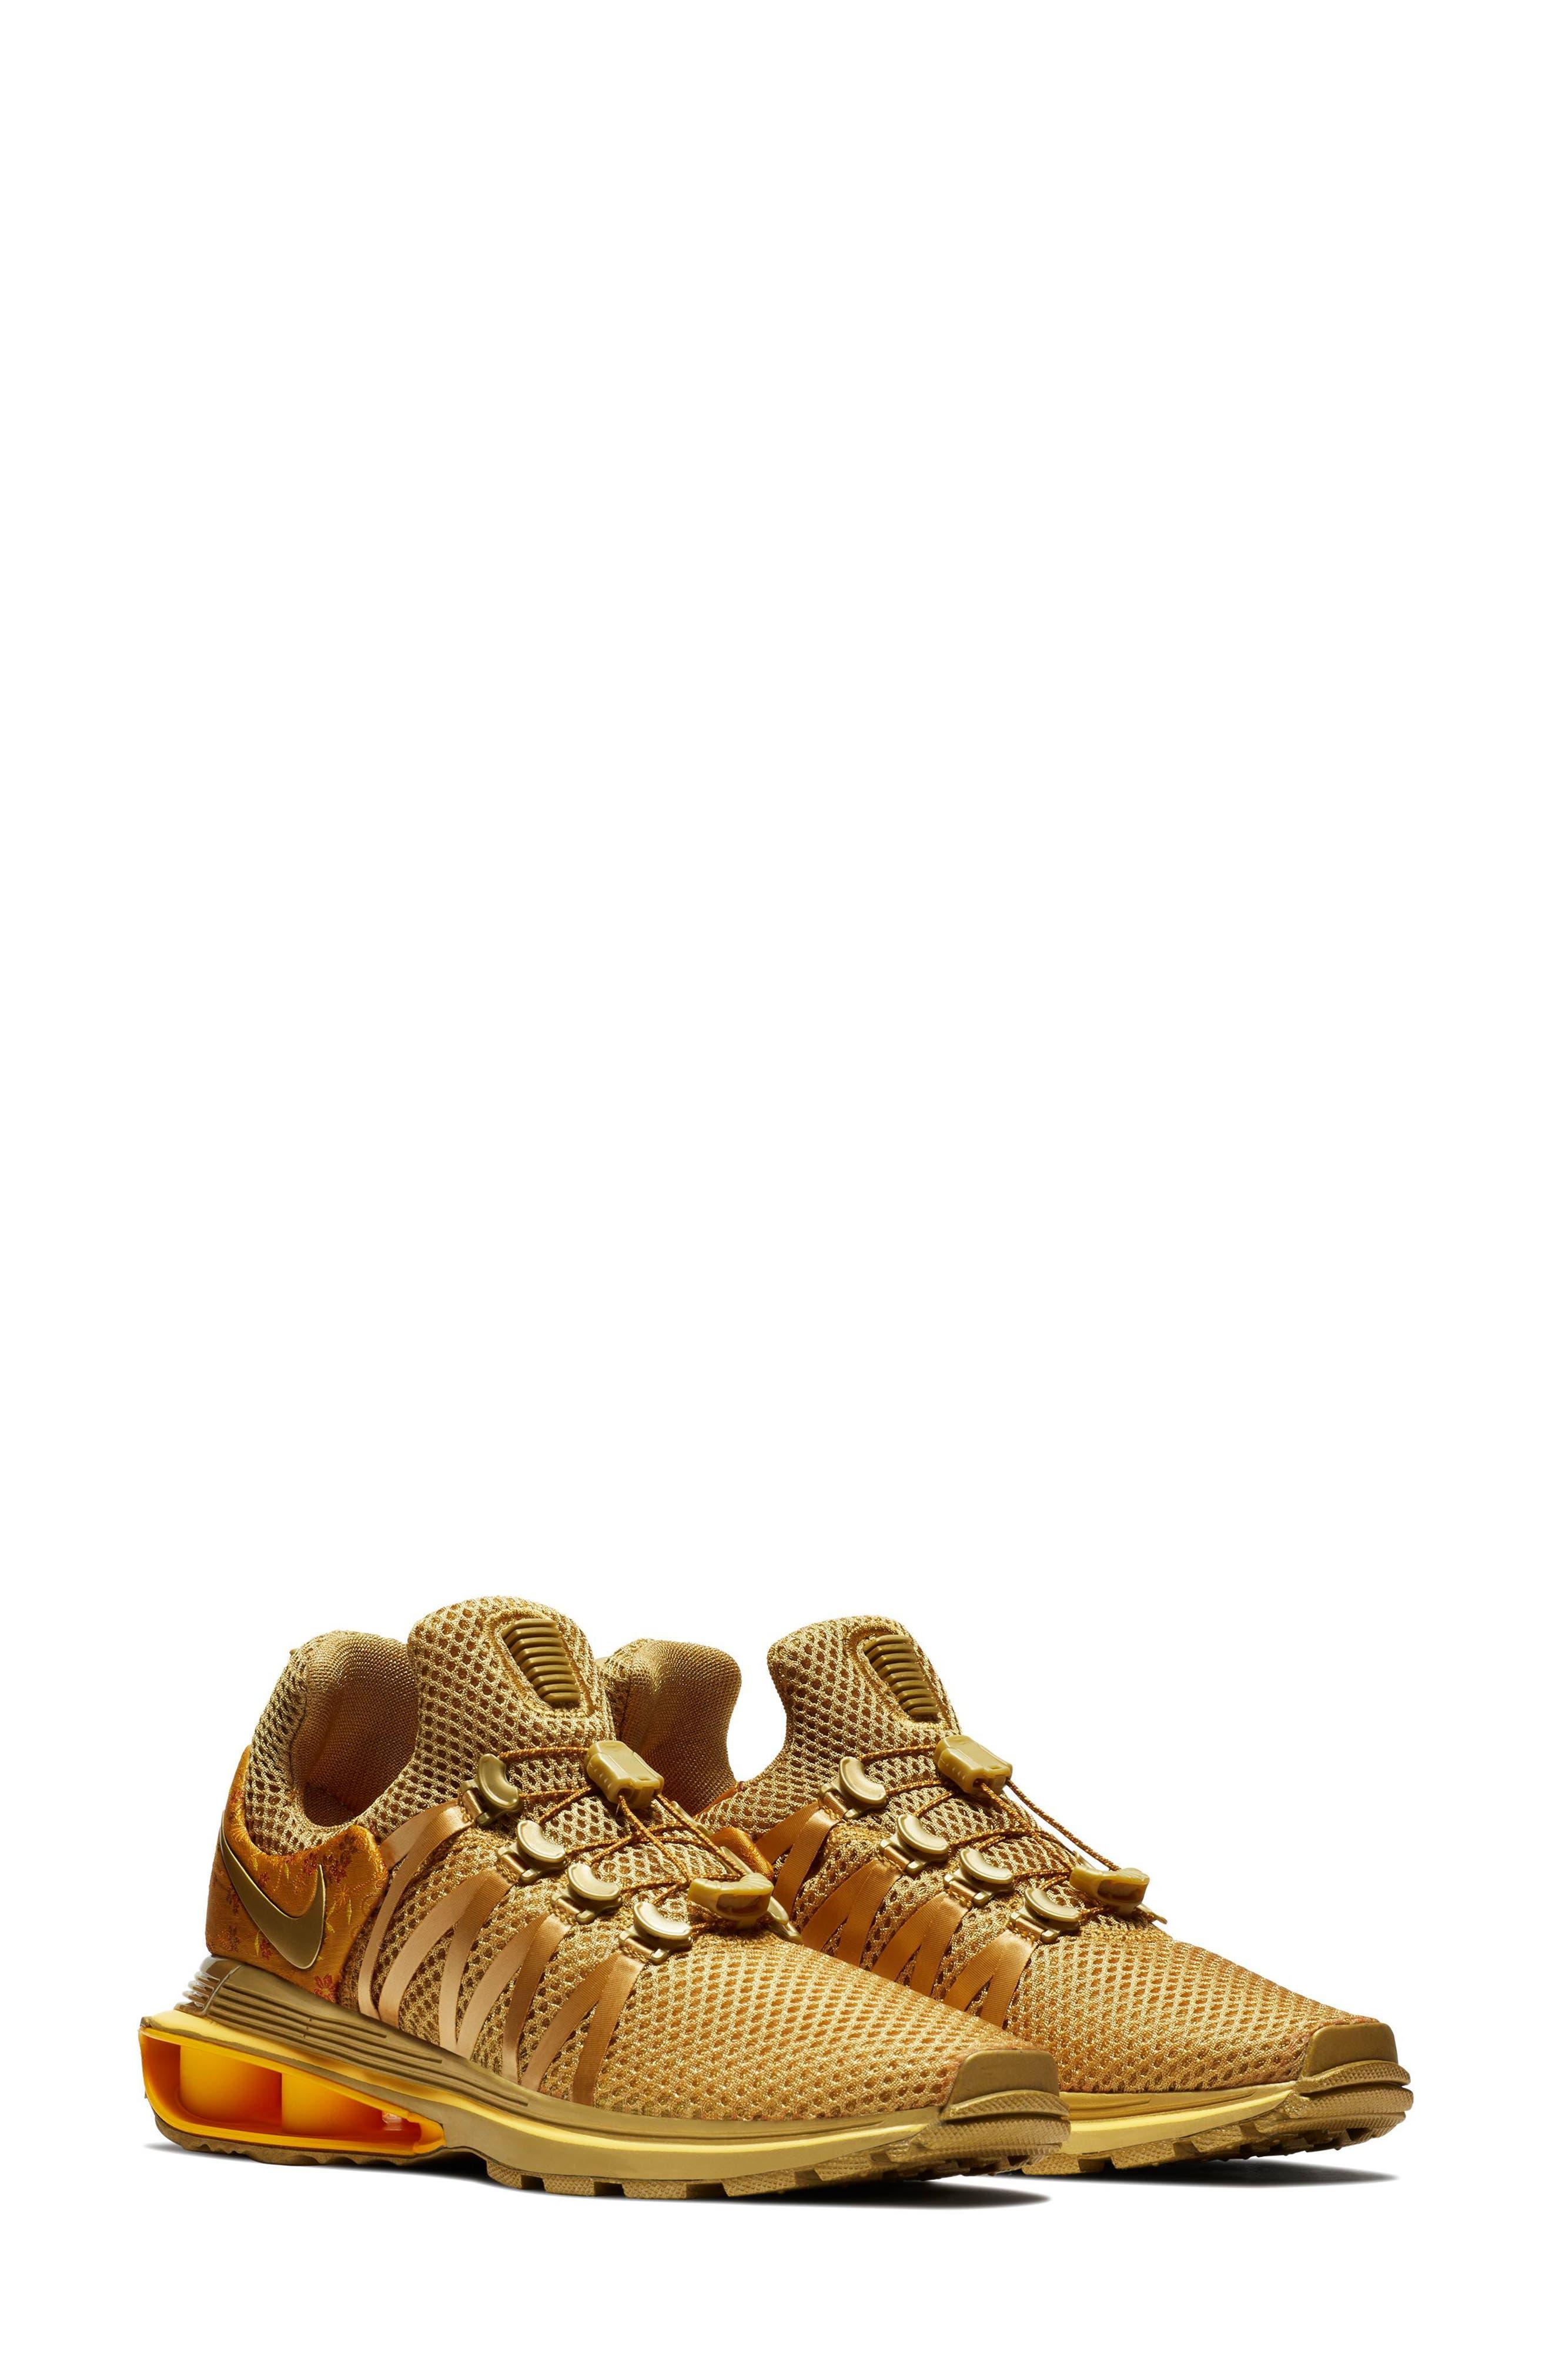 Shox Gravity Sneaker,                         Main,                         color, Metallic Gold/ Metallic Gold